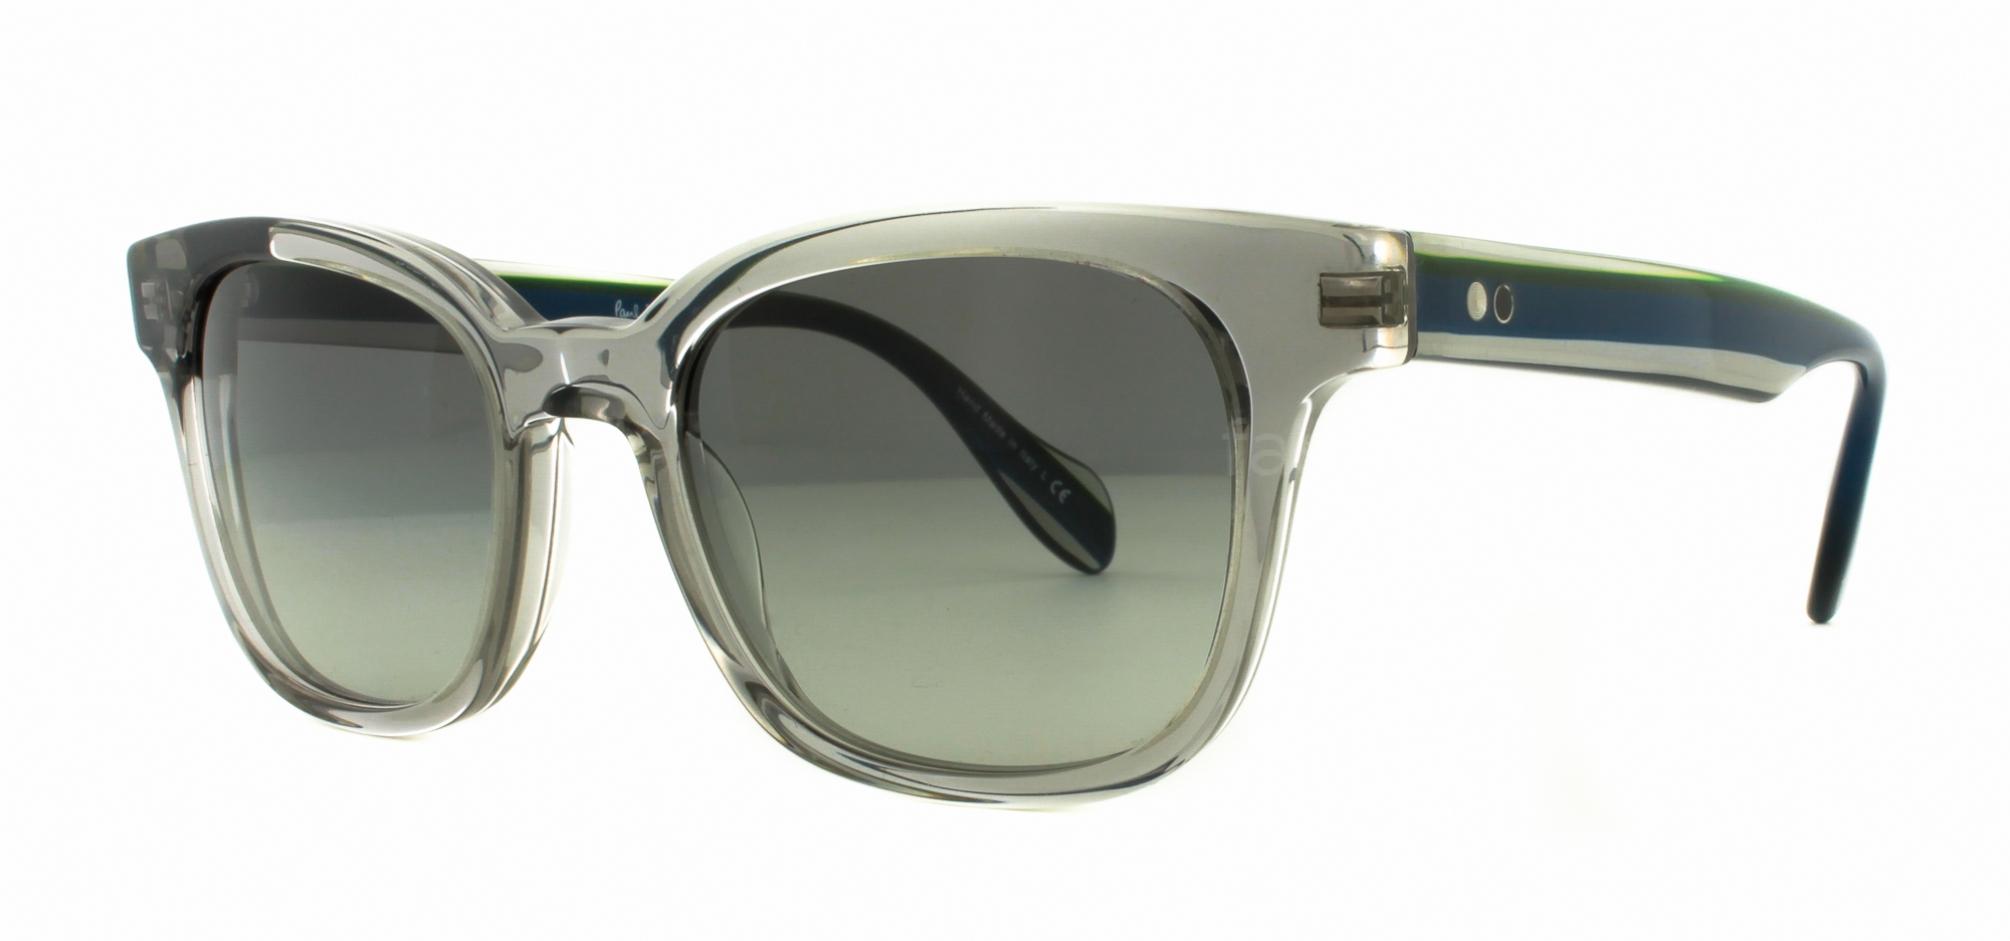 ac472299747 Buy Paul Smith Sunglasses directly from eyeglassesdepot.com